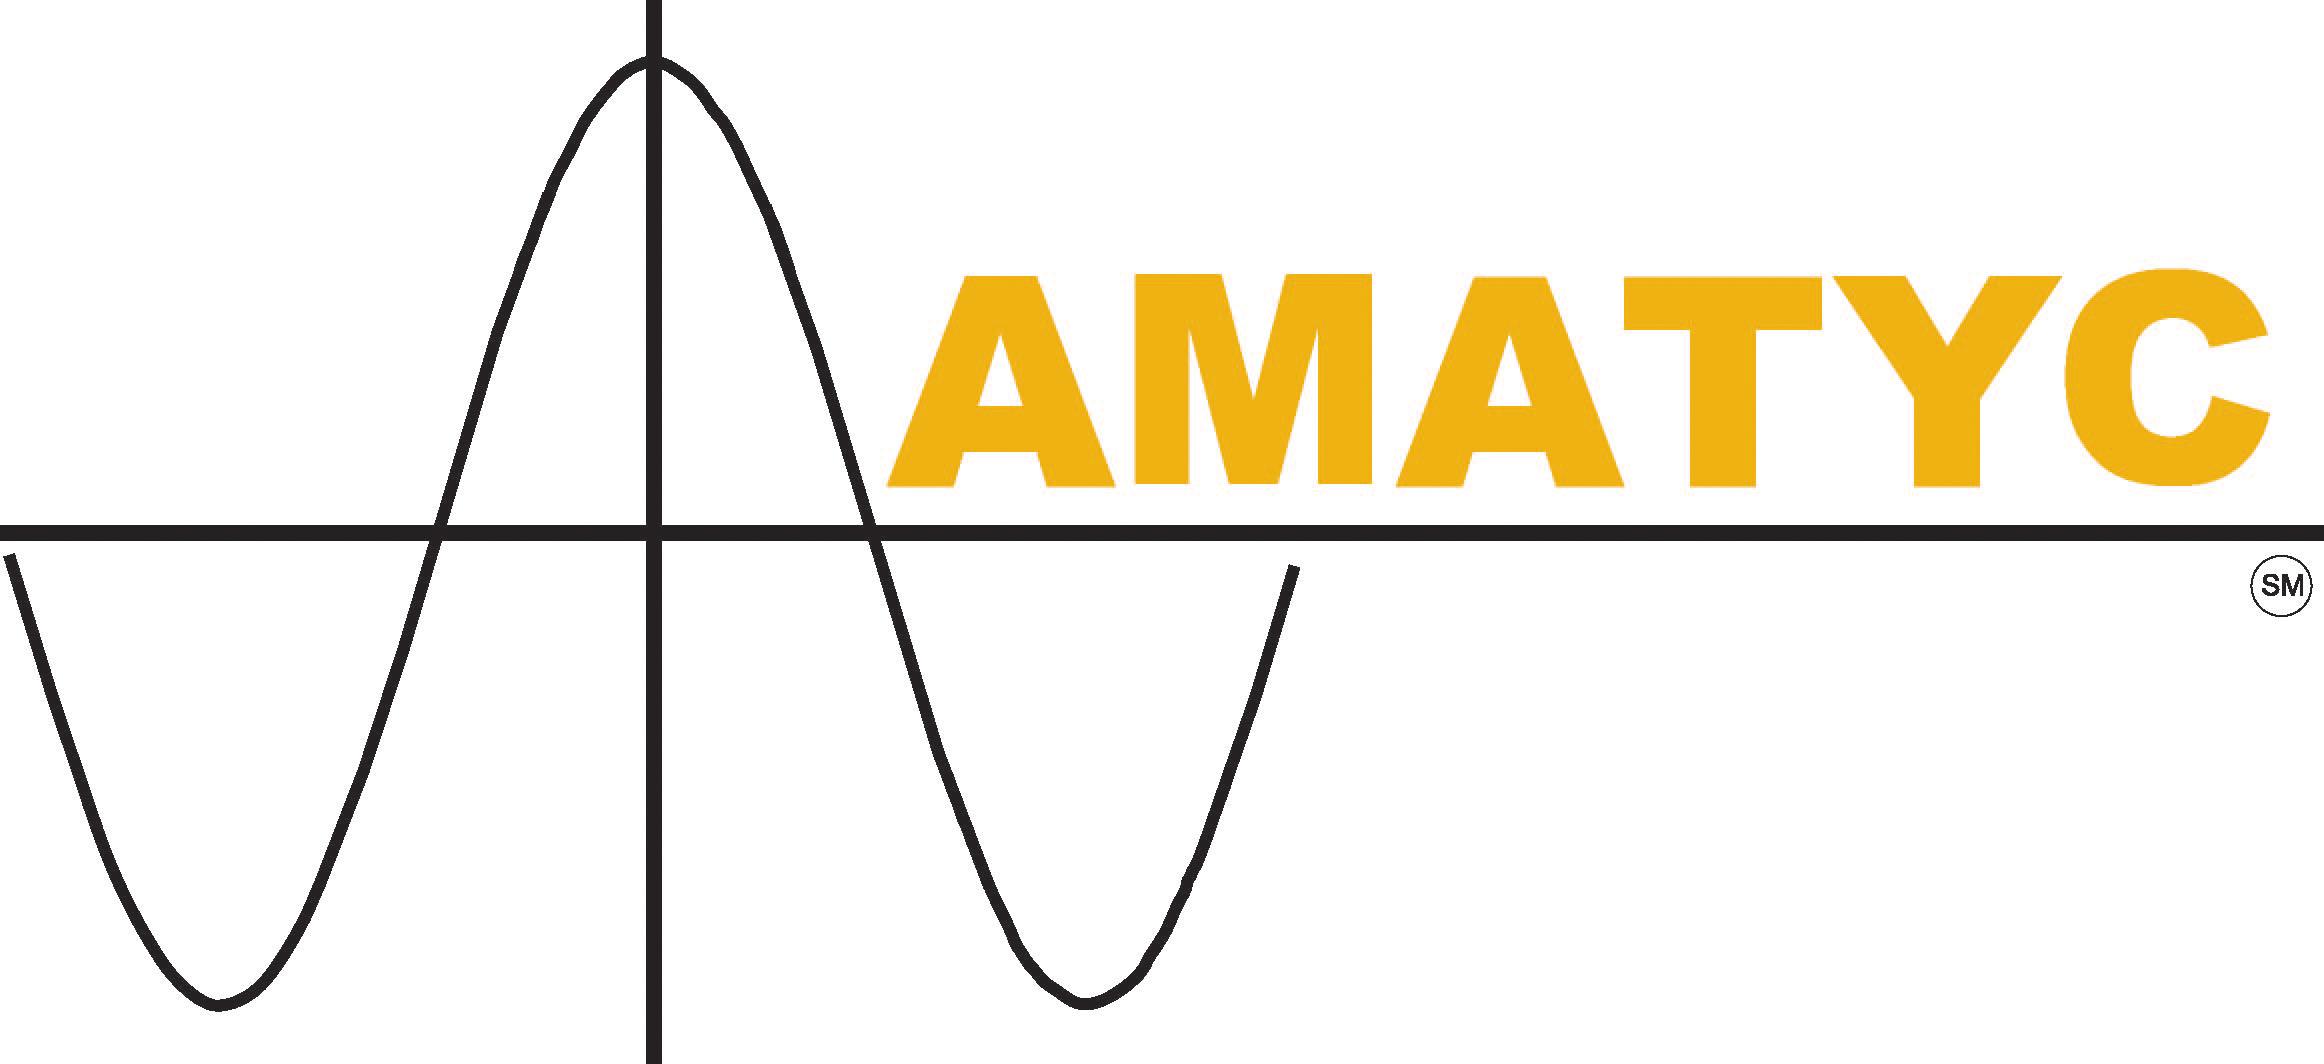 AMATYC-IMPACT Live!